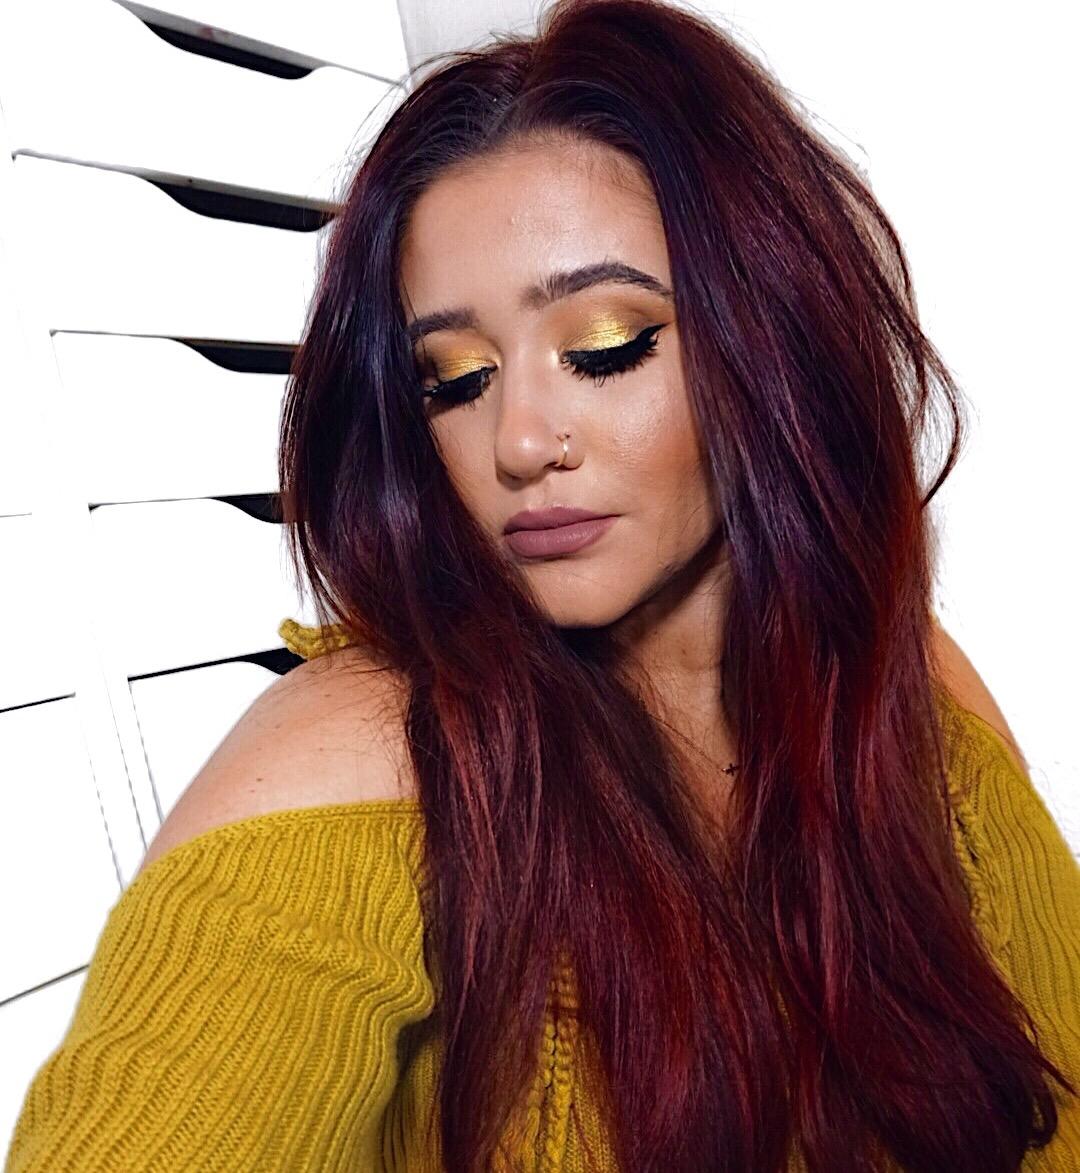 Fall Eyeshadow Obsession + Lip Combo I Love